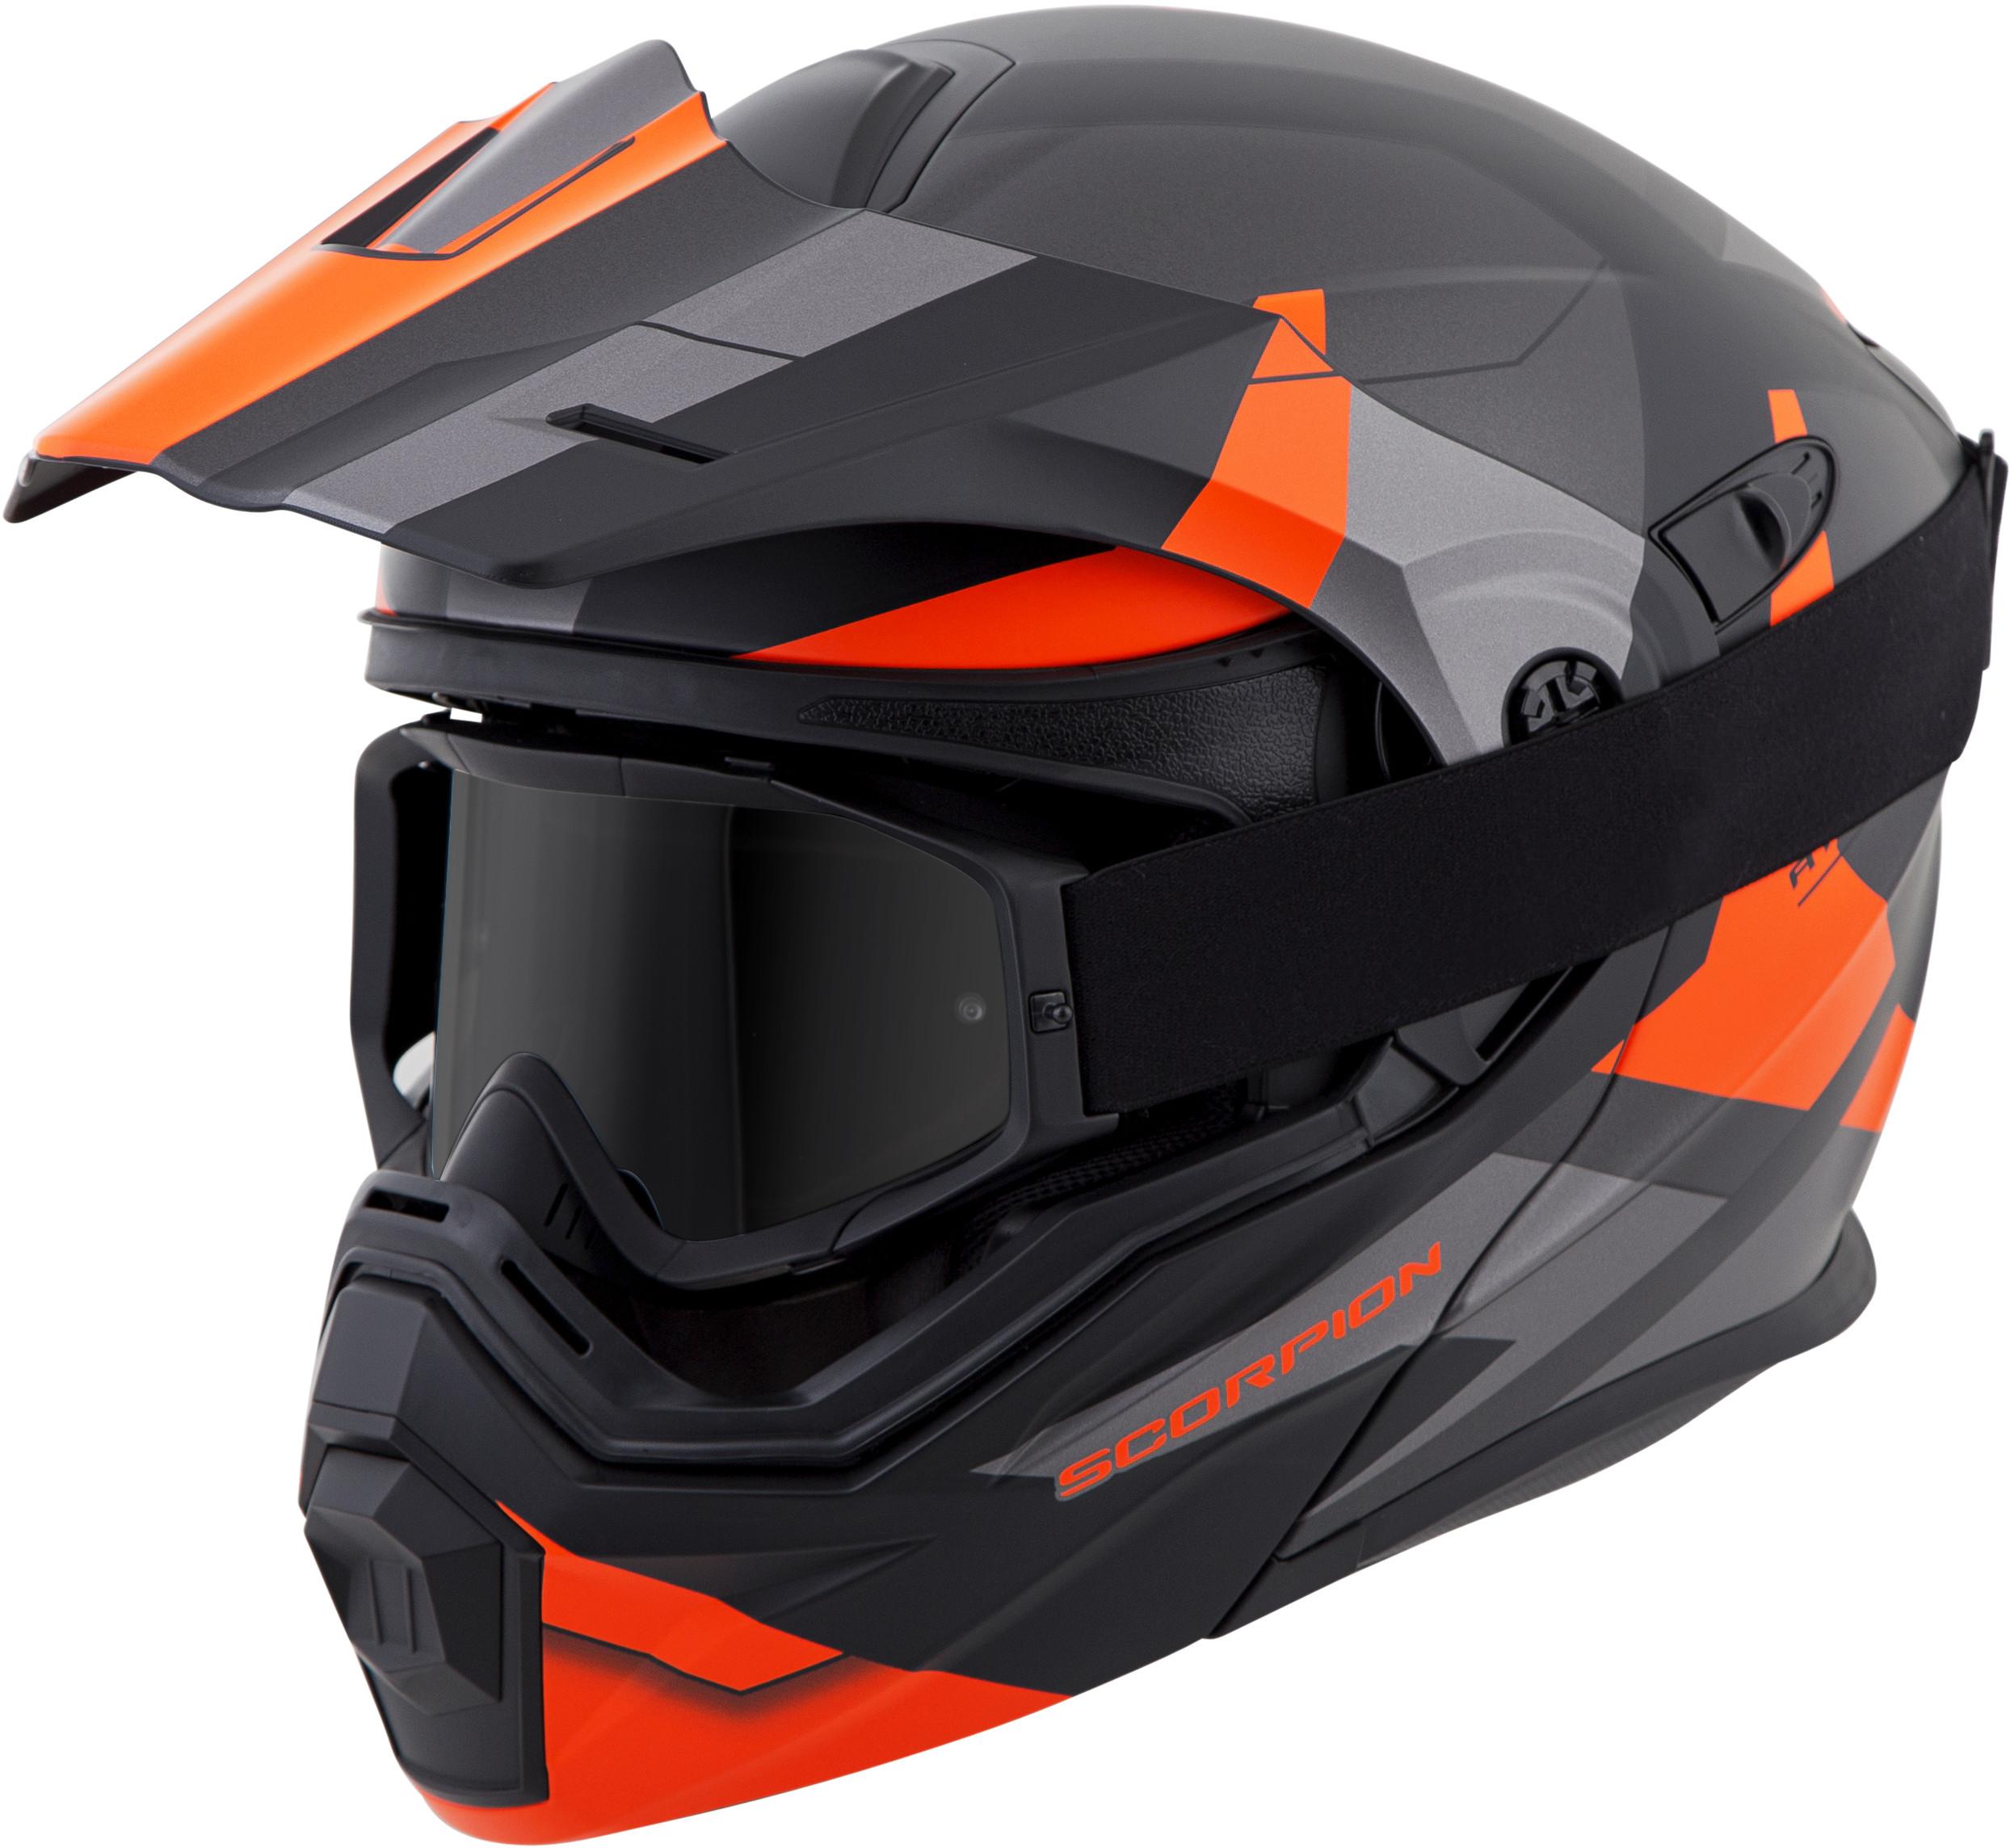 for-Scorpion-Helmet-EXO-AT950-Neocon-Snow-Helmet-with-Dual-Lens-Shield miniature 12